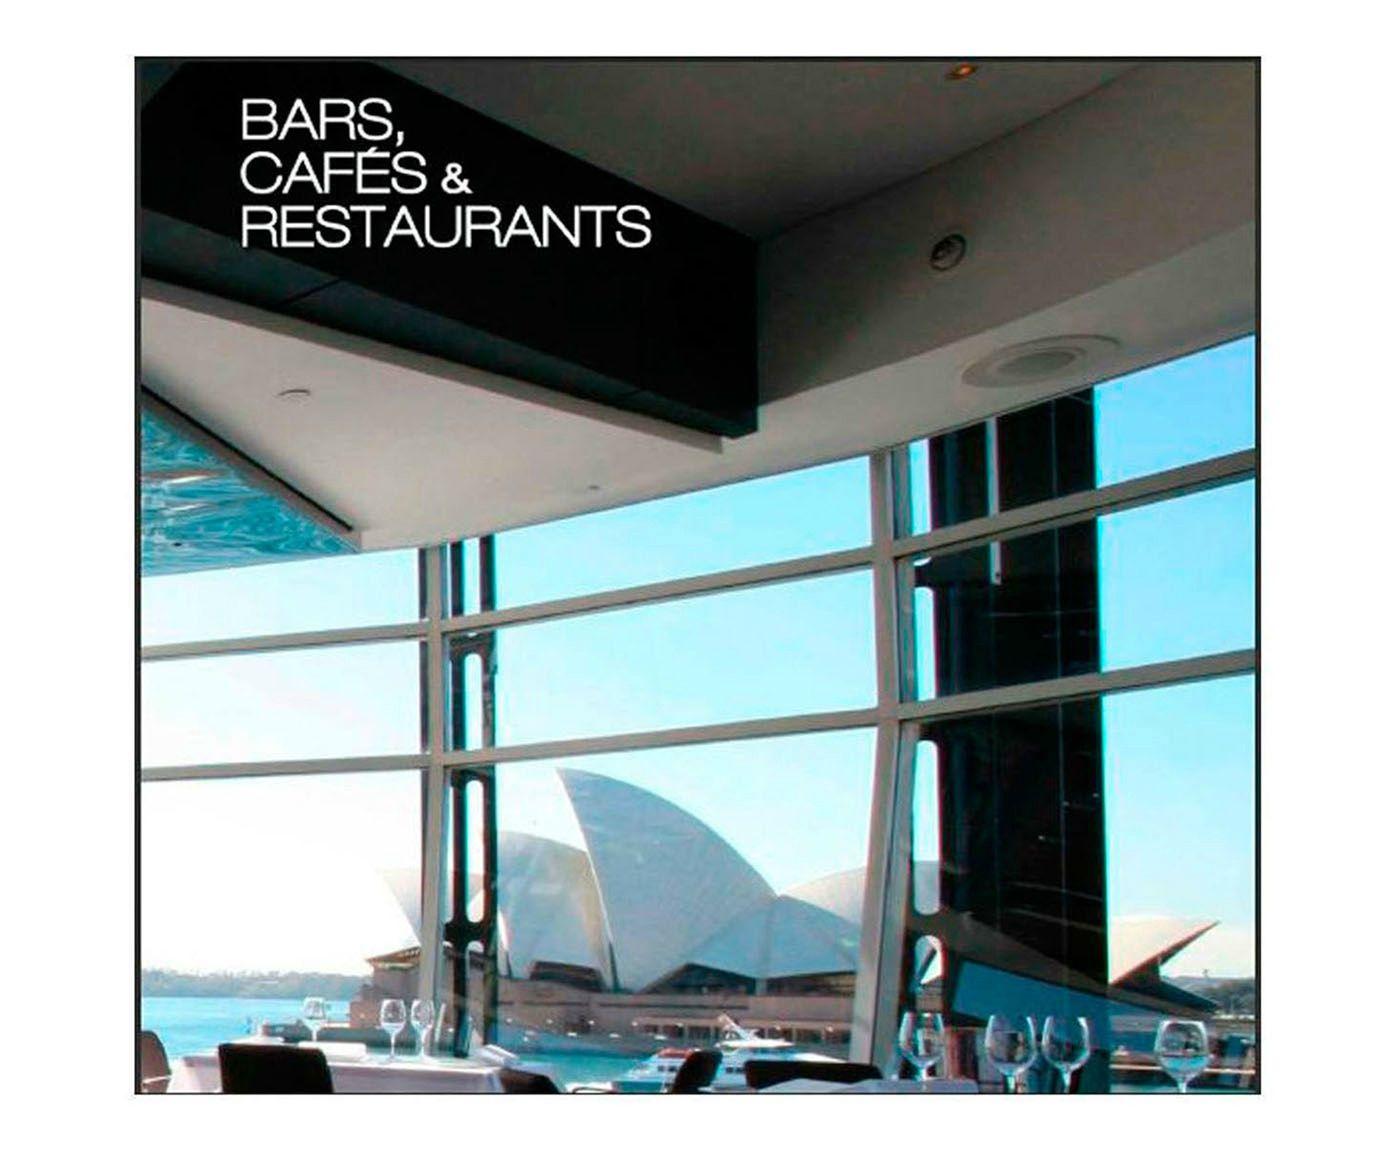 Livro Bars, Cafés e Restaurants | Westwing.com.br